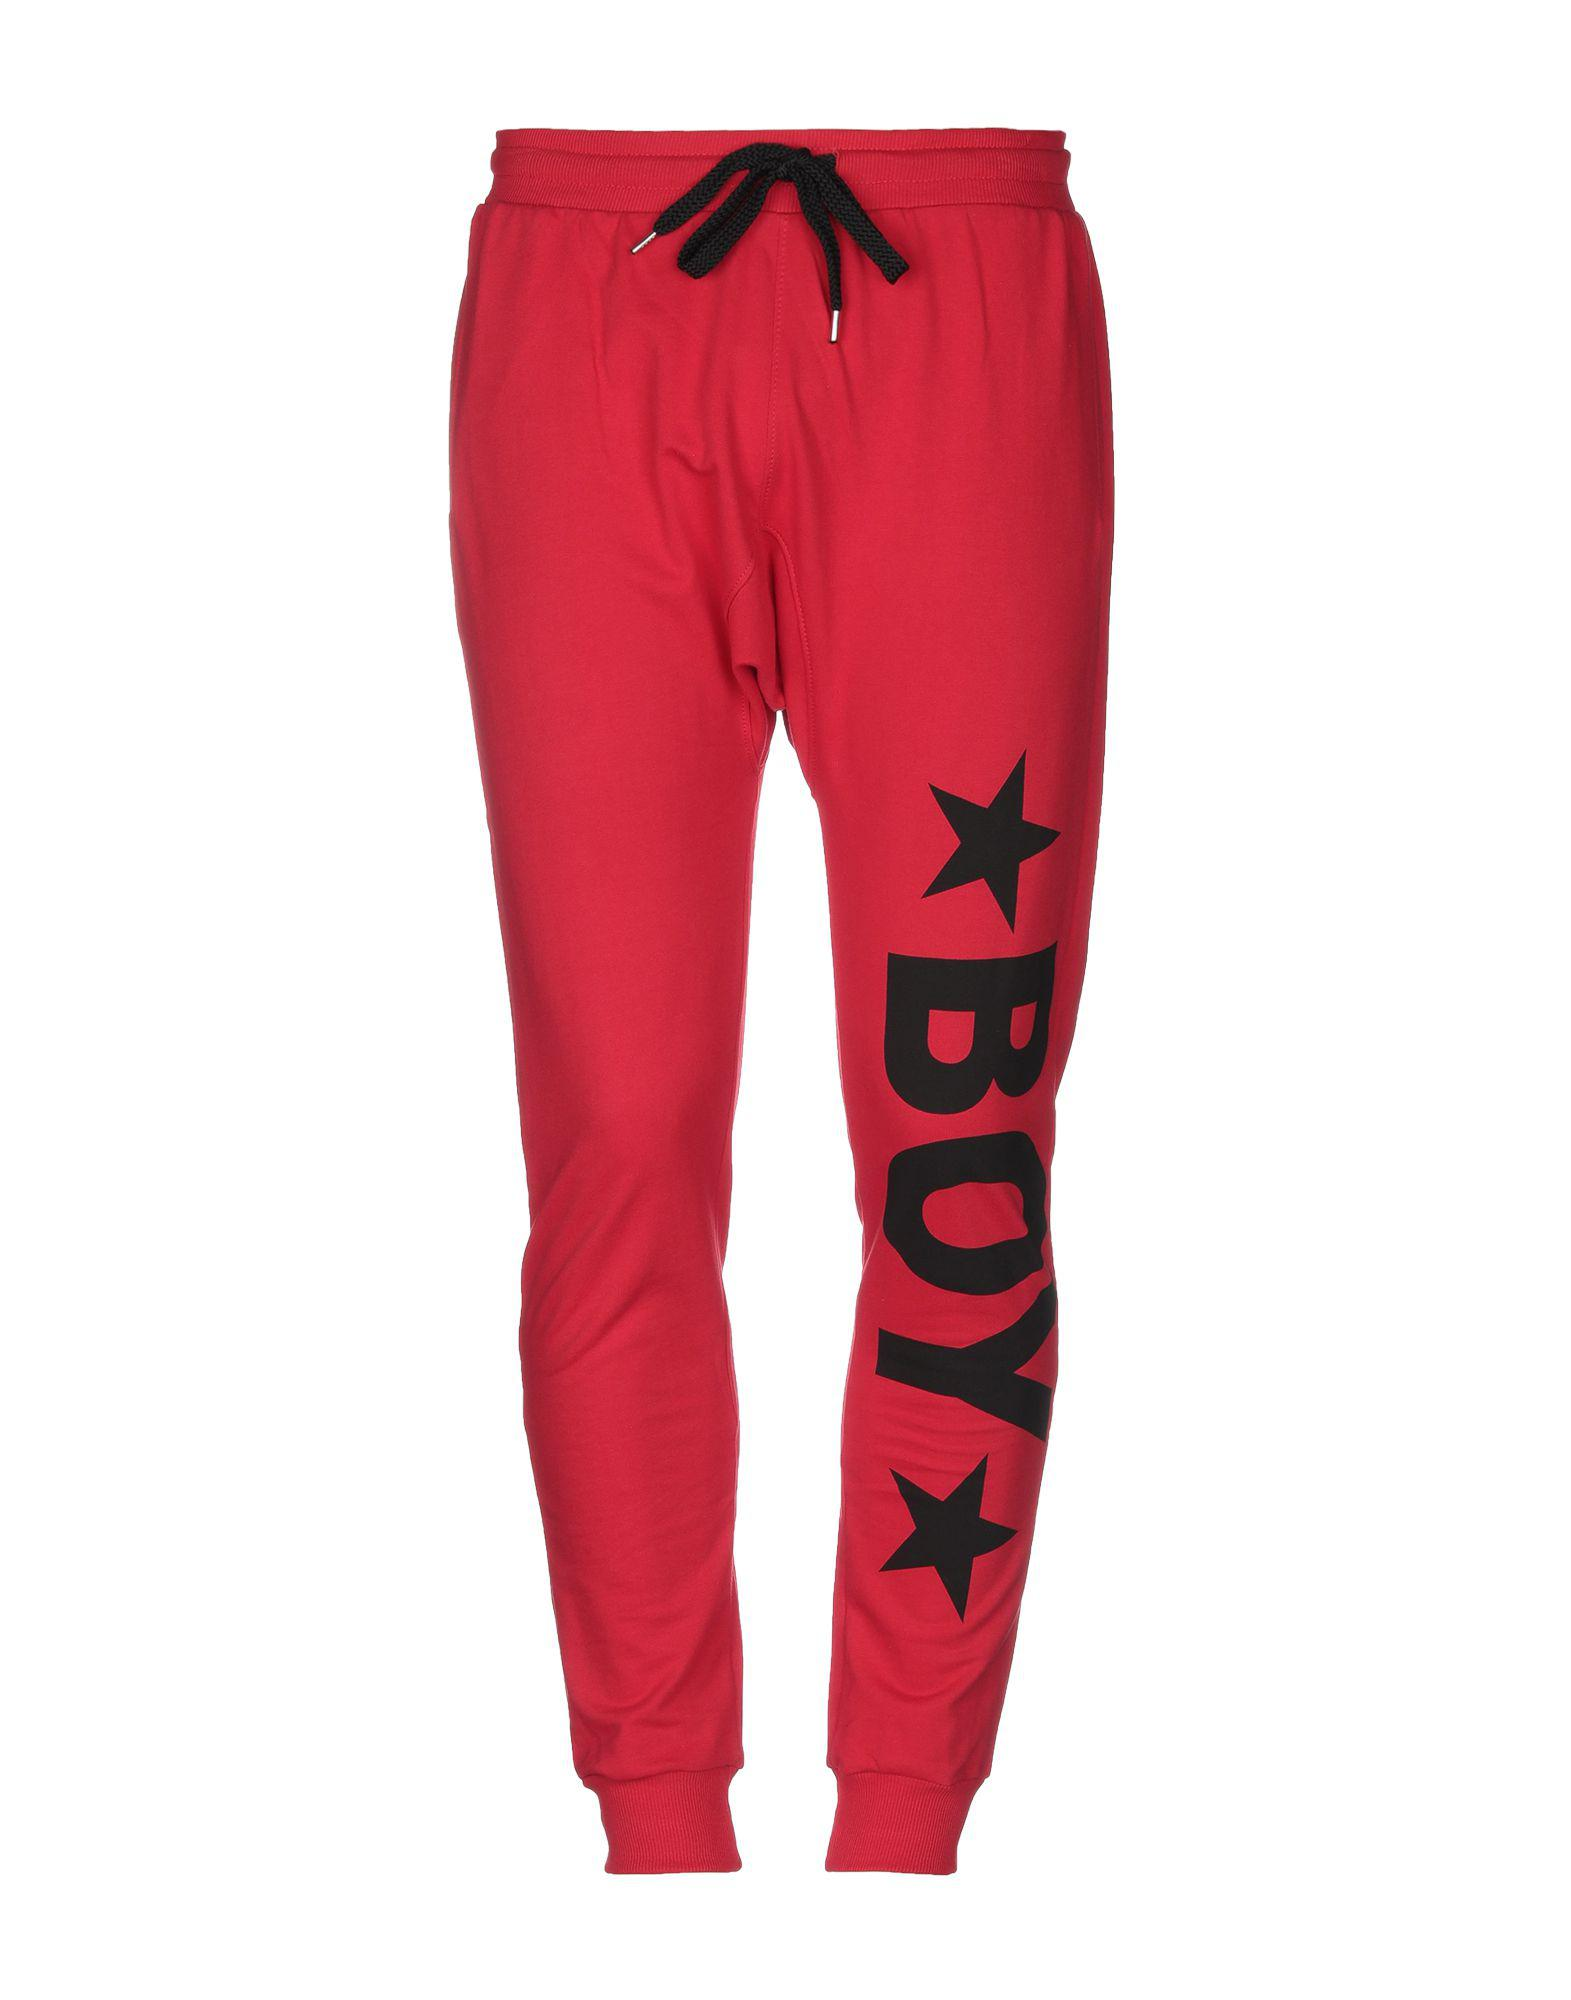 Boy London Color Rojo Lyst Pantalones De Hombre qSMUzVpG